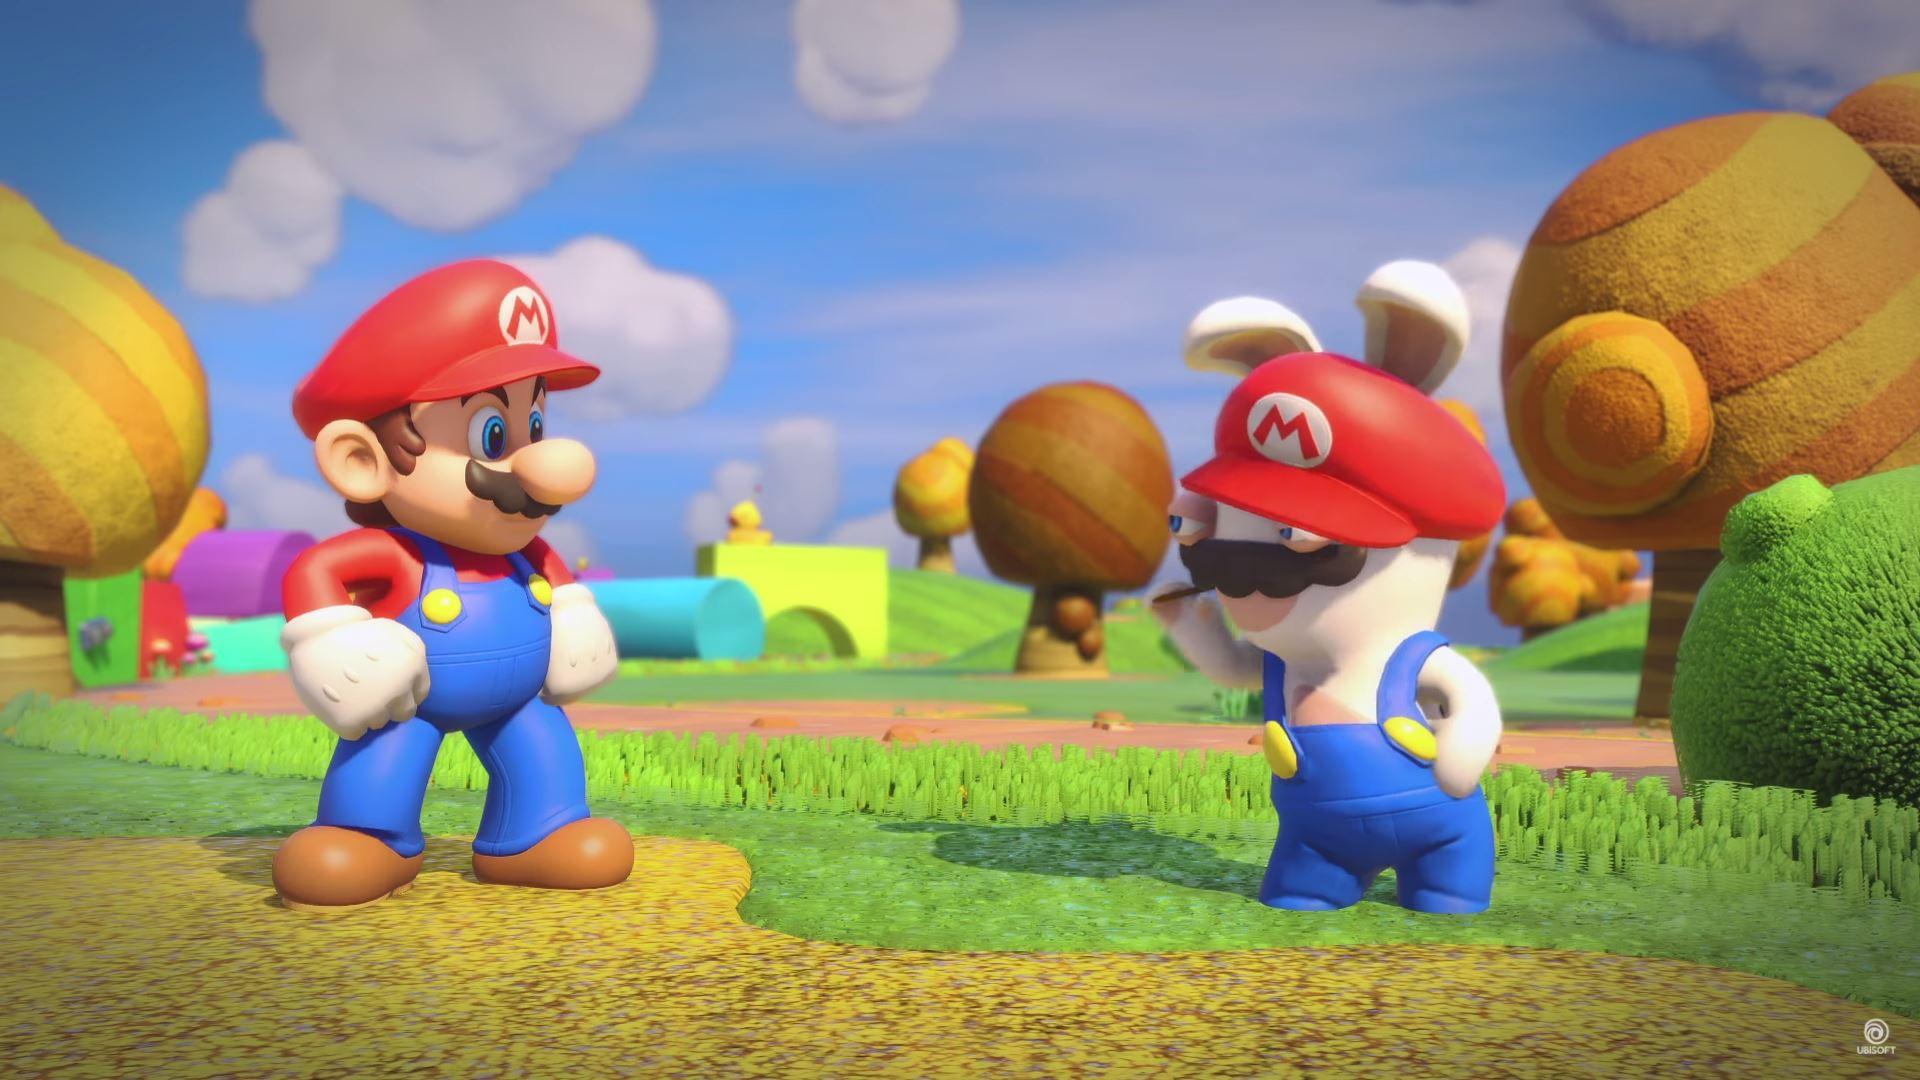 Mario + Rabbids Kingdom Battle - Best Strategy Game of E3 2017 - WINNER